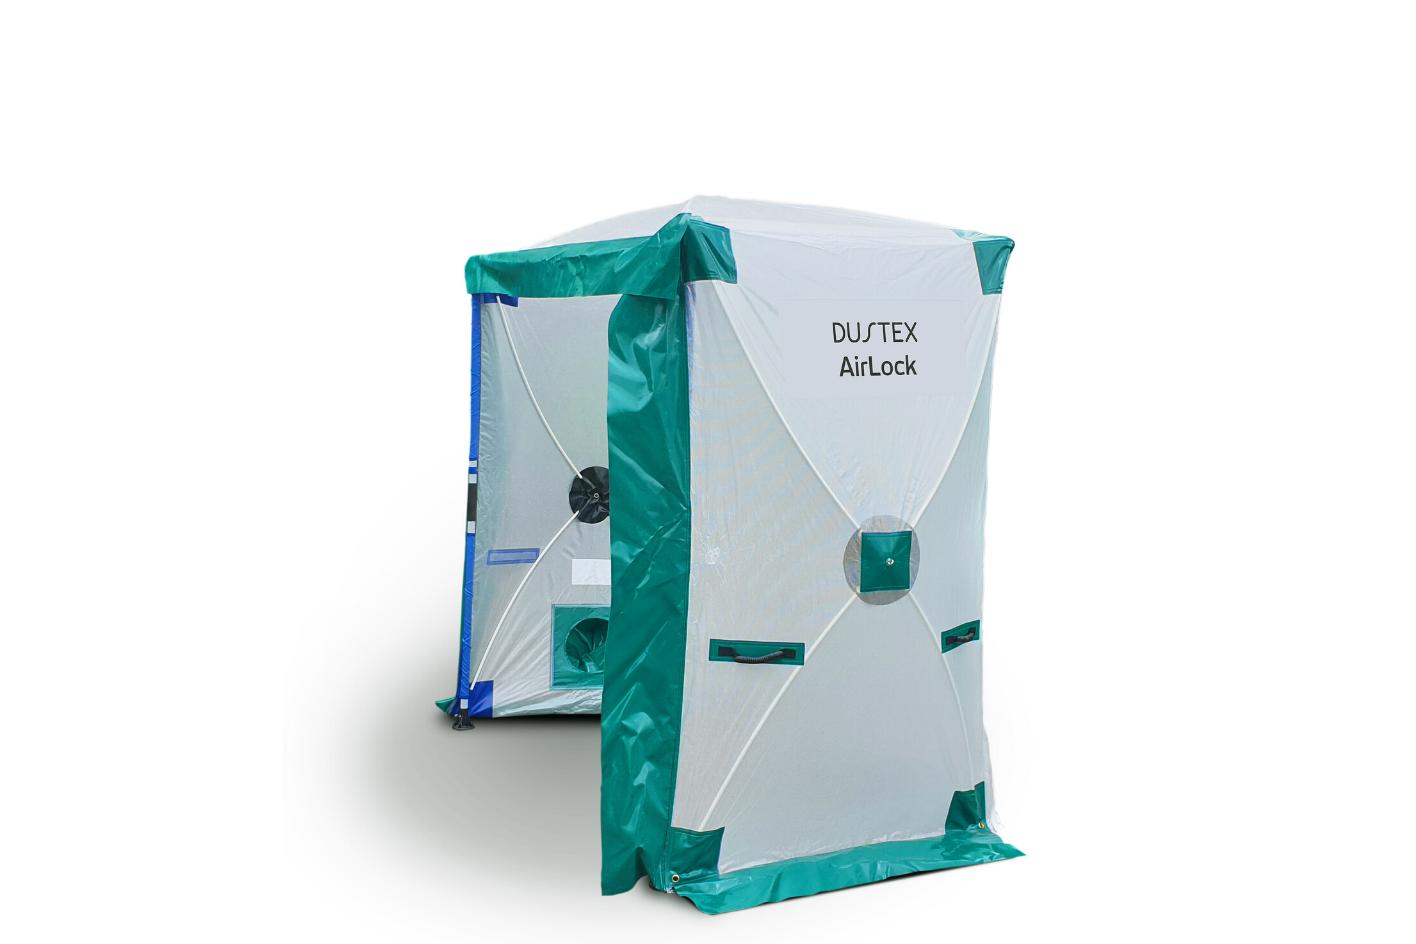 Dustex Air Lock